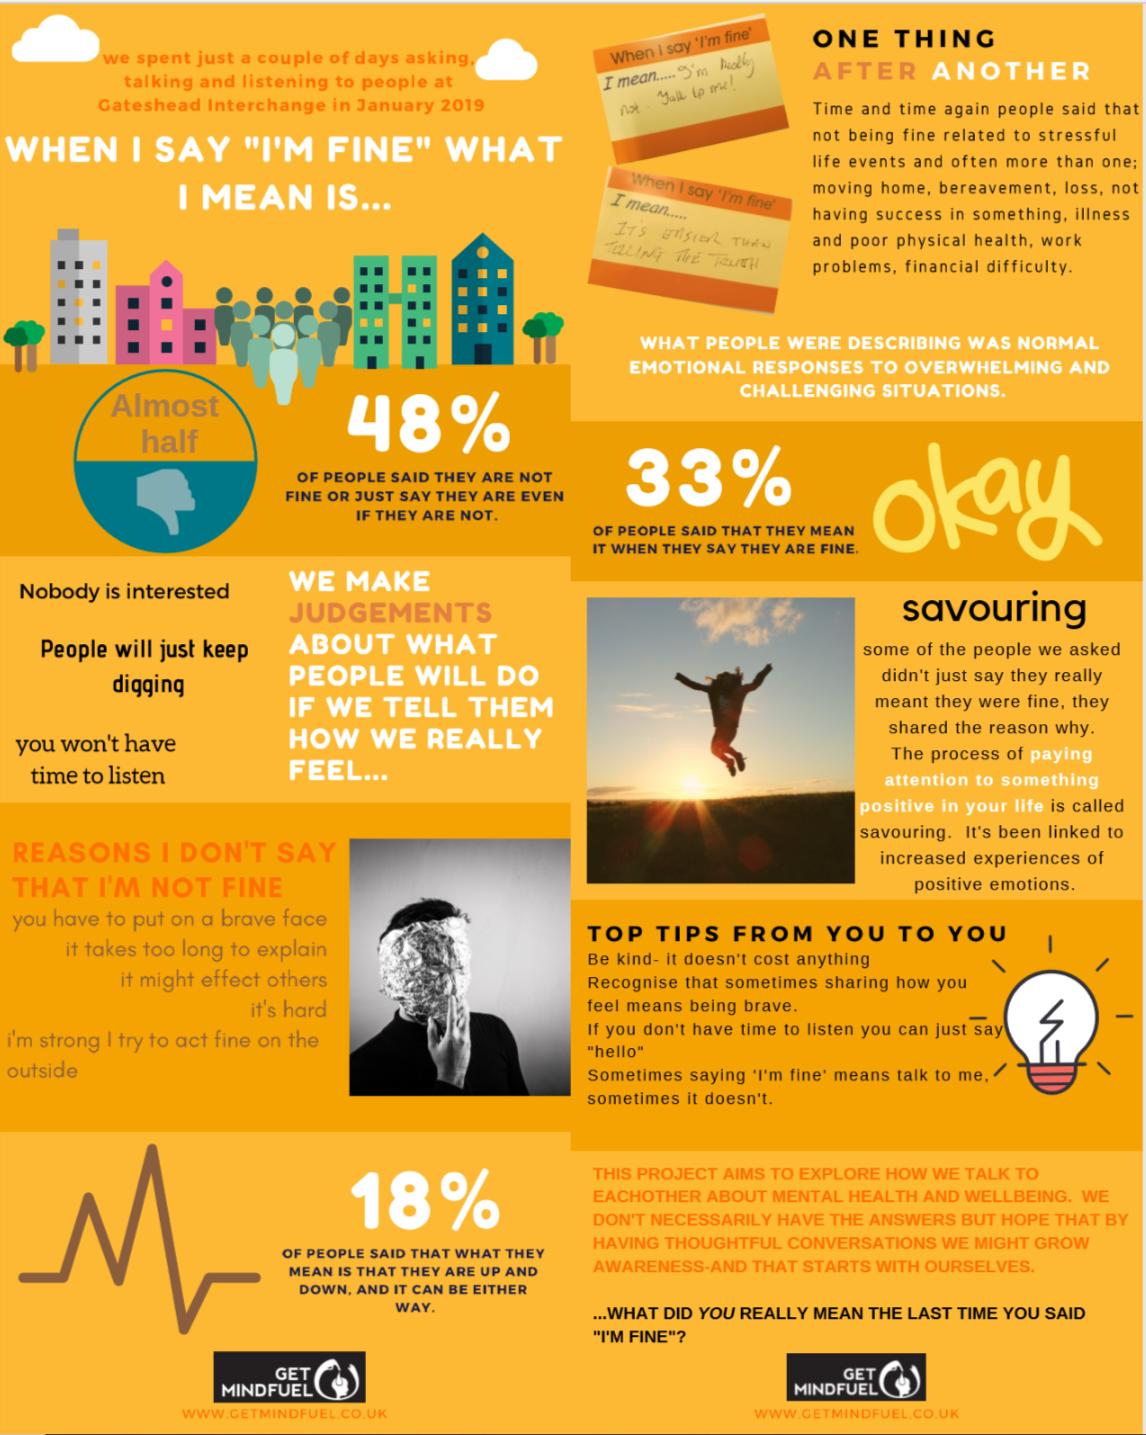 Summary information poster